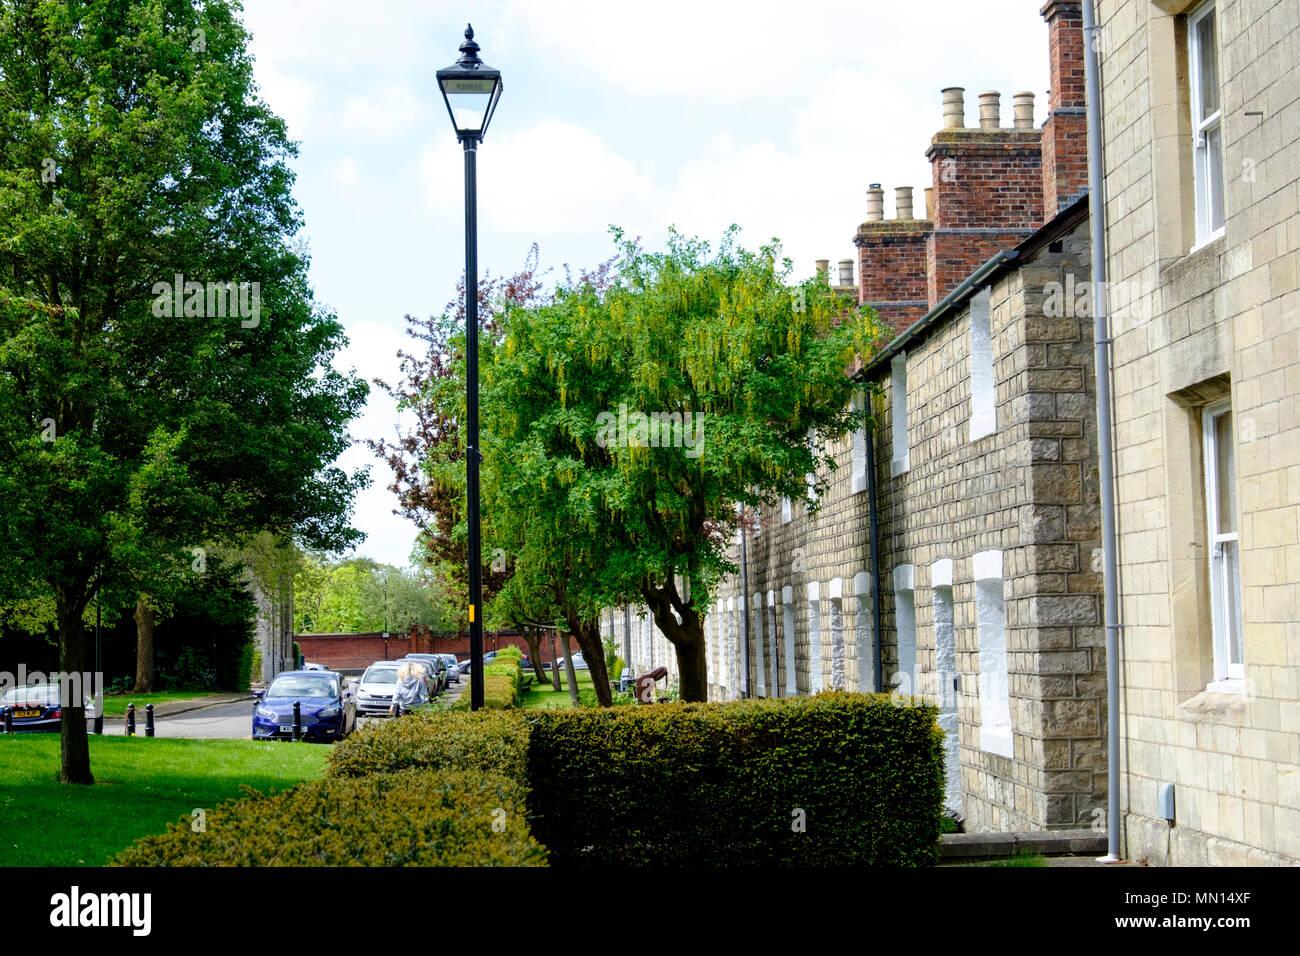 Railway Cottages Swindon Stock Photos & Railway Cottages